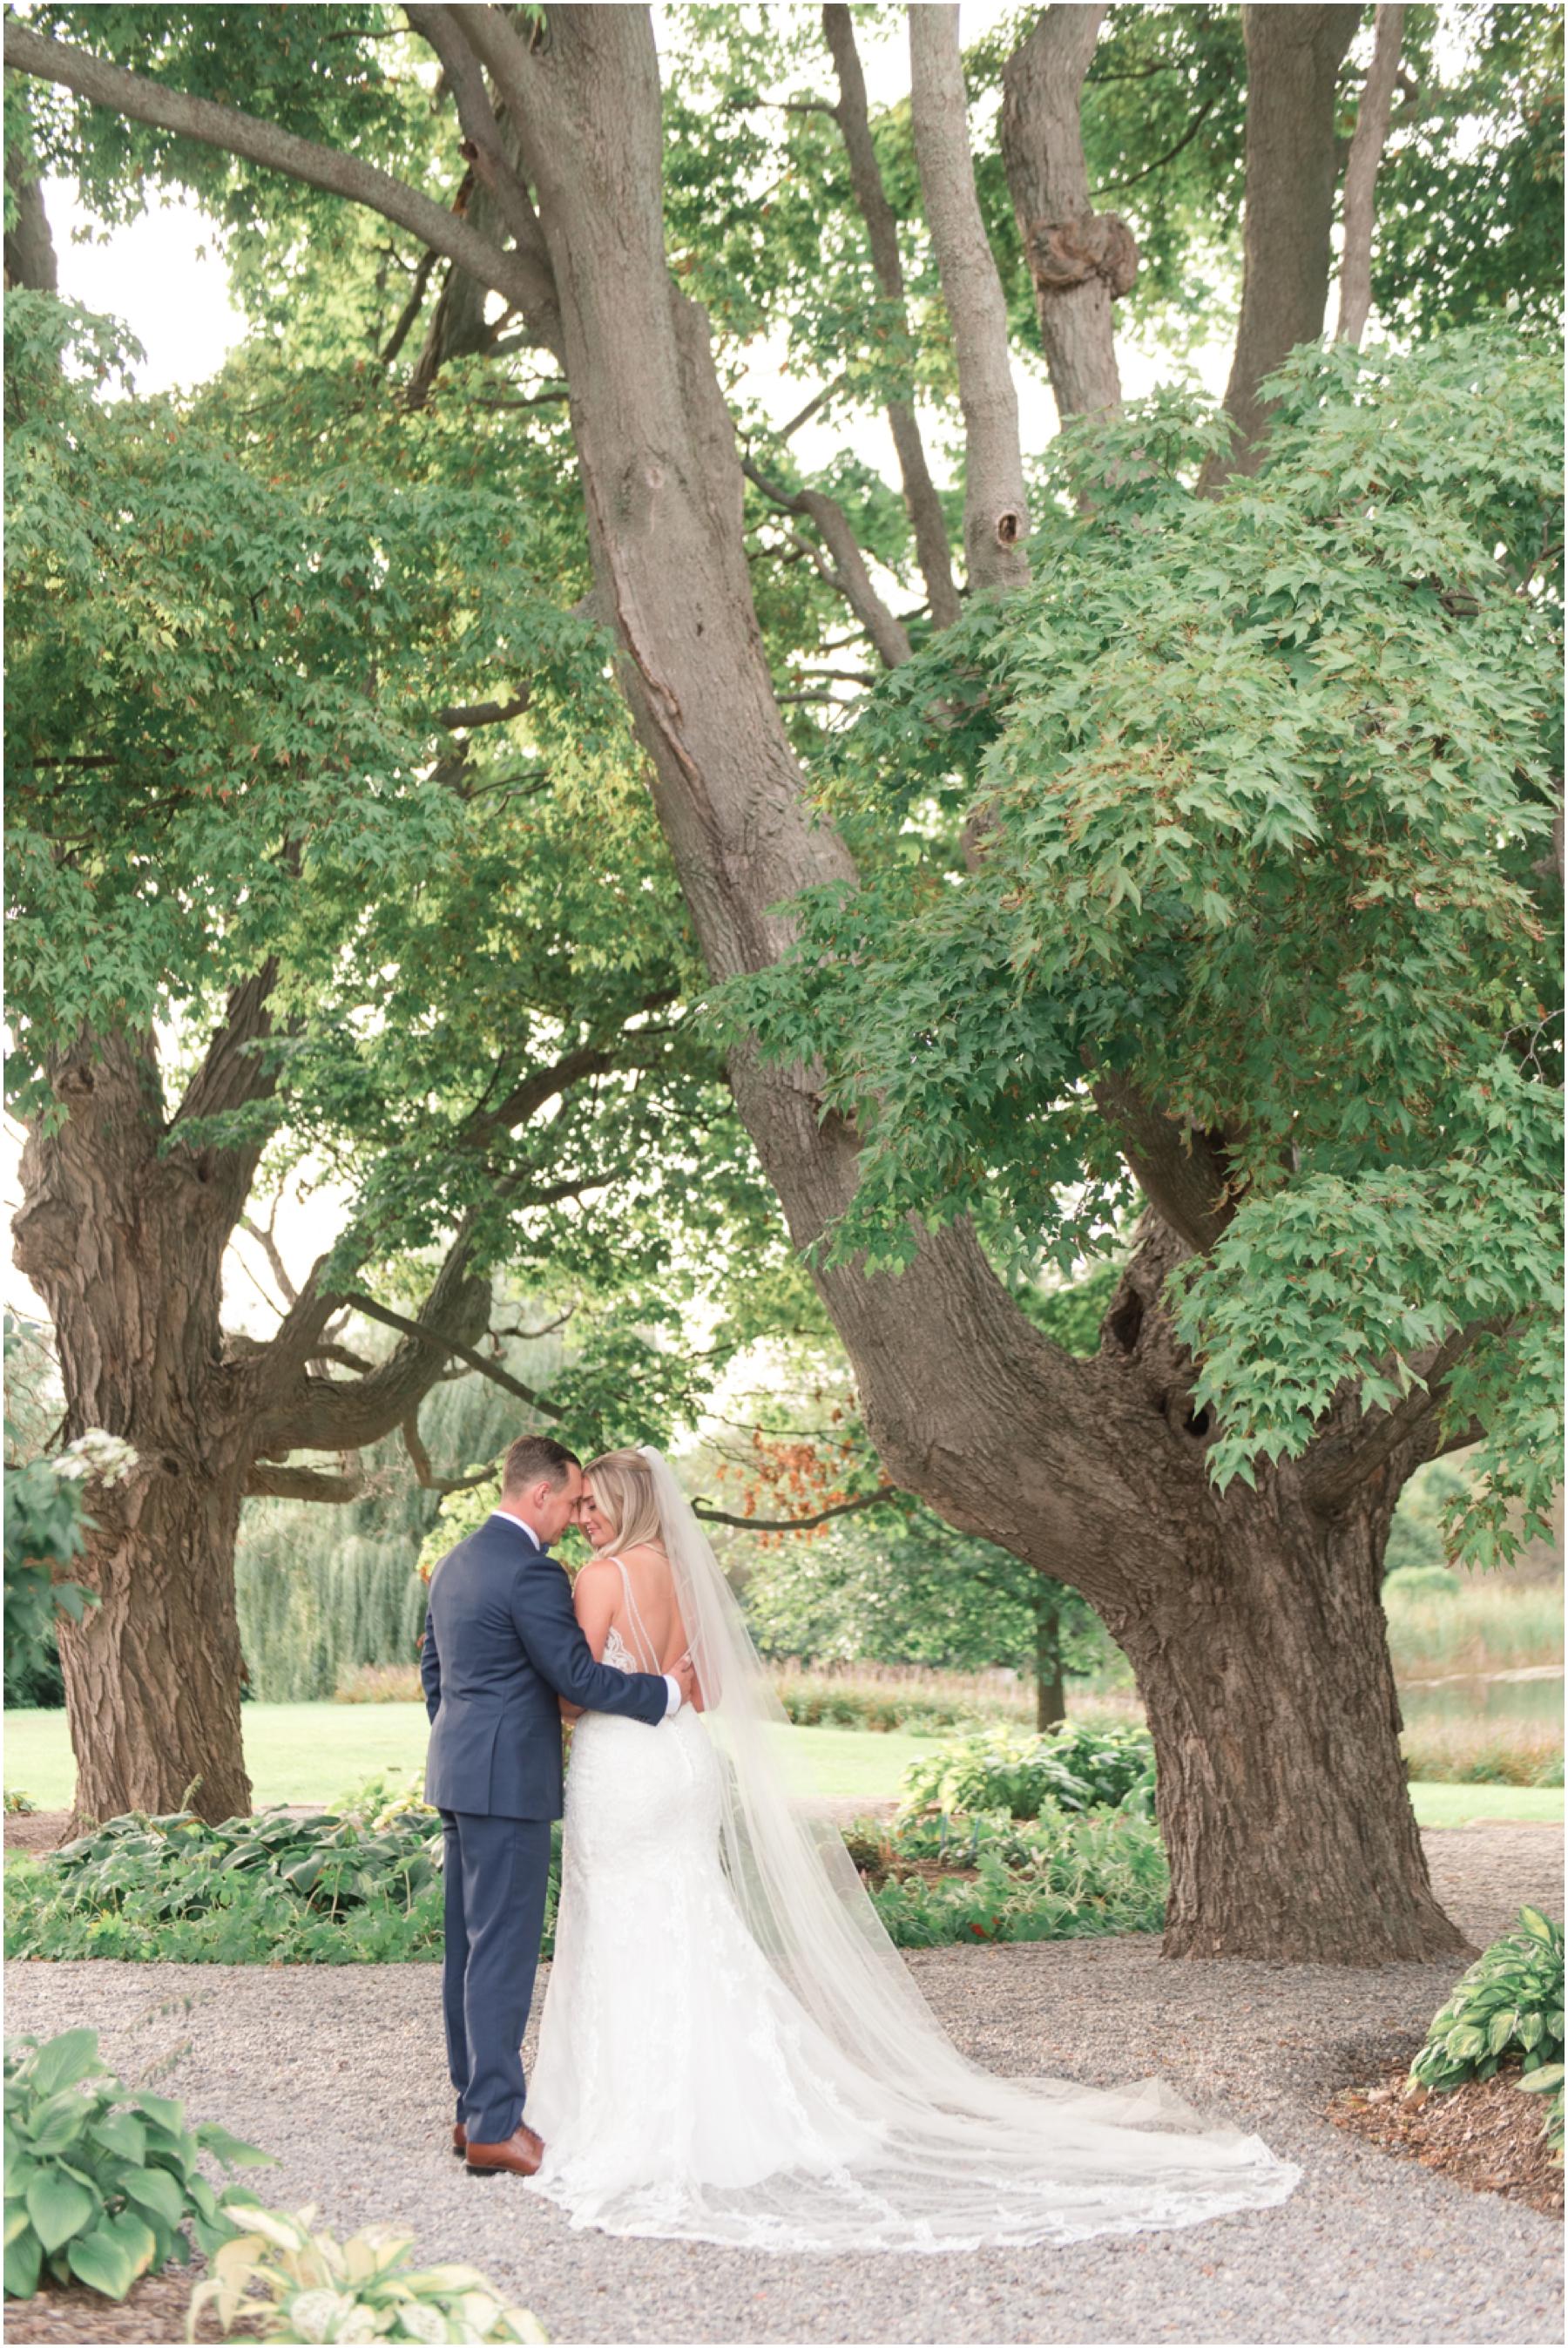 Bloom Field Gardens Wedding Precious Photography Katherine & Chris_068